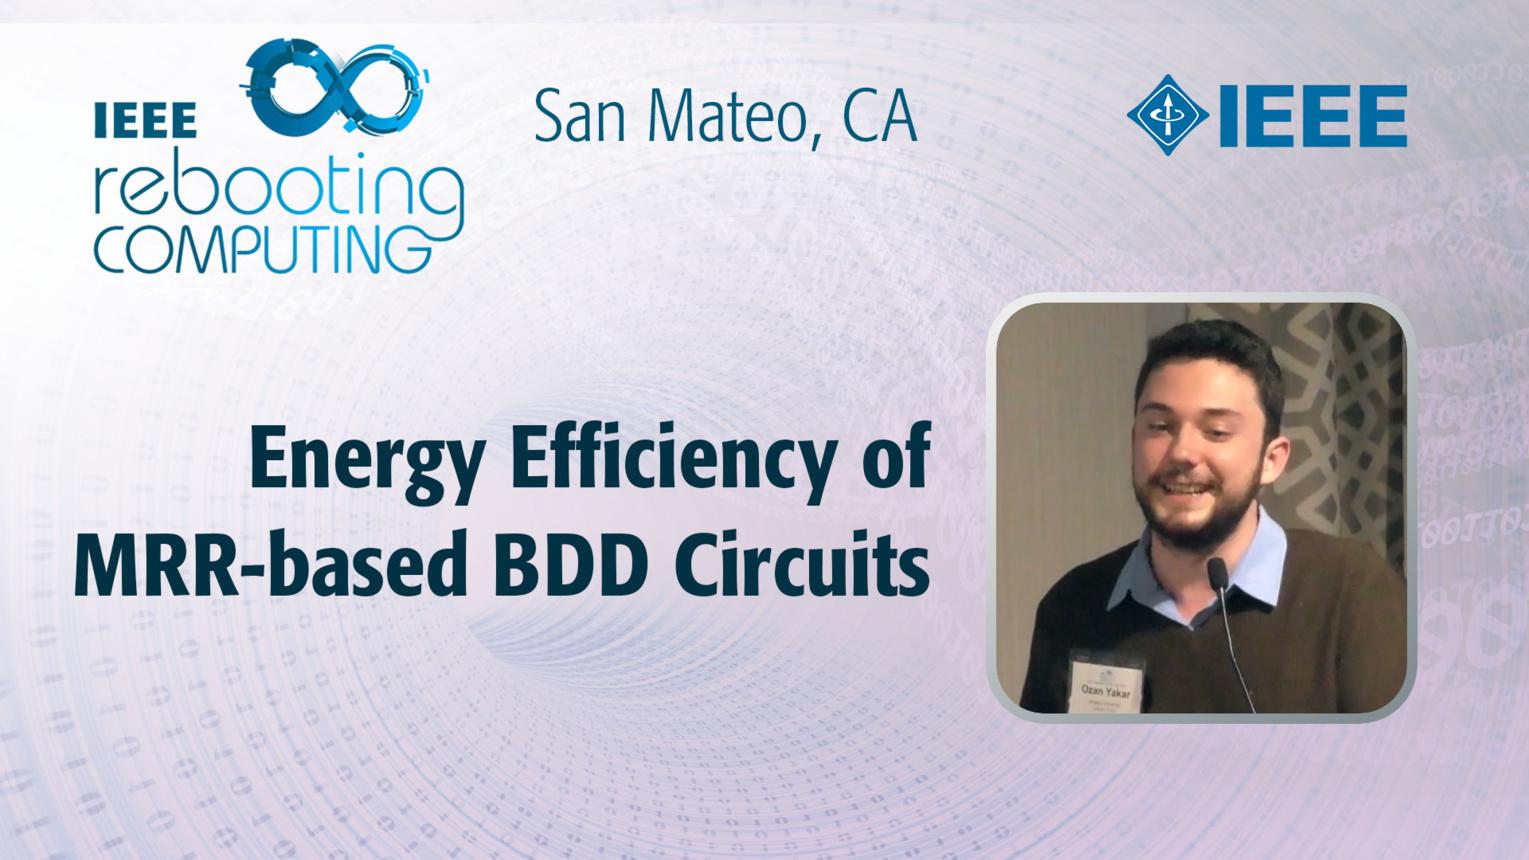 Energy Efficiency of MRR-based BDD Circuits - Ozan Yakar - ICRC San Mateo, 2019